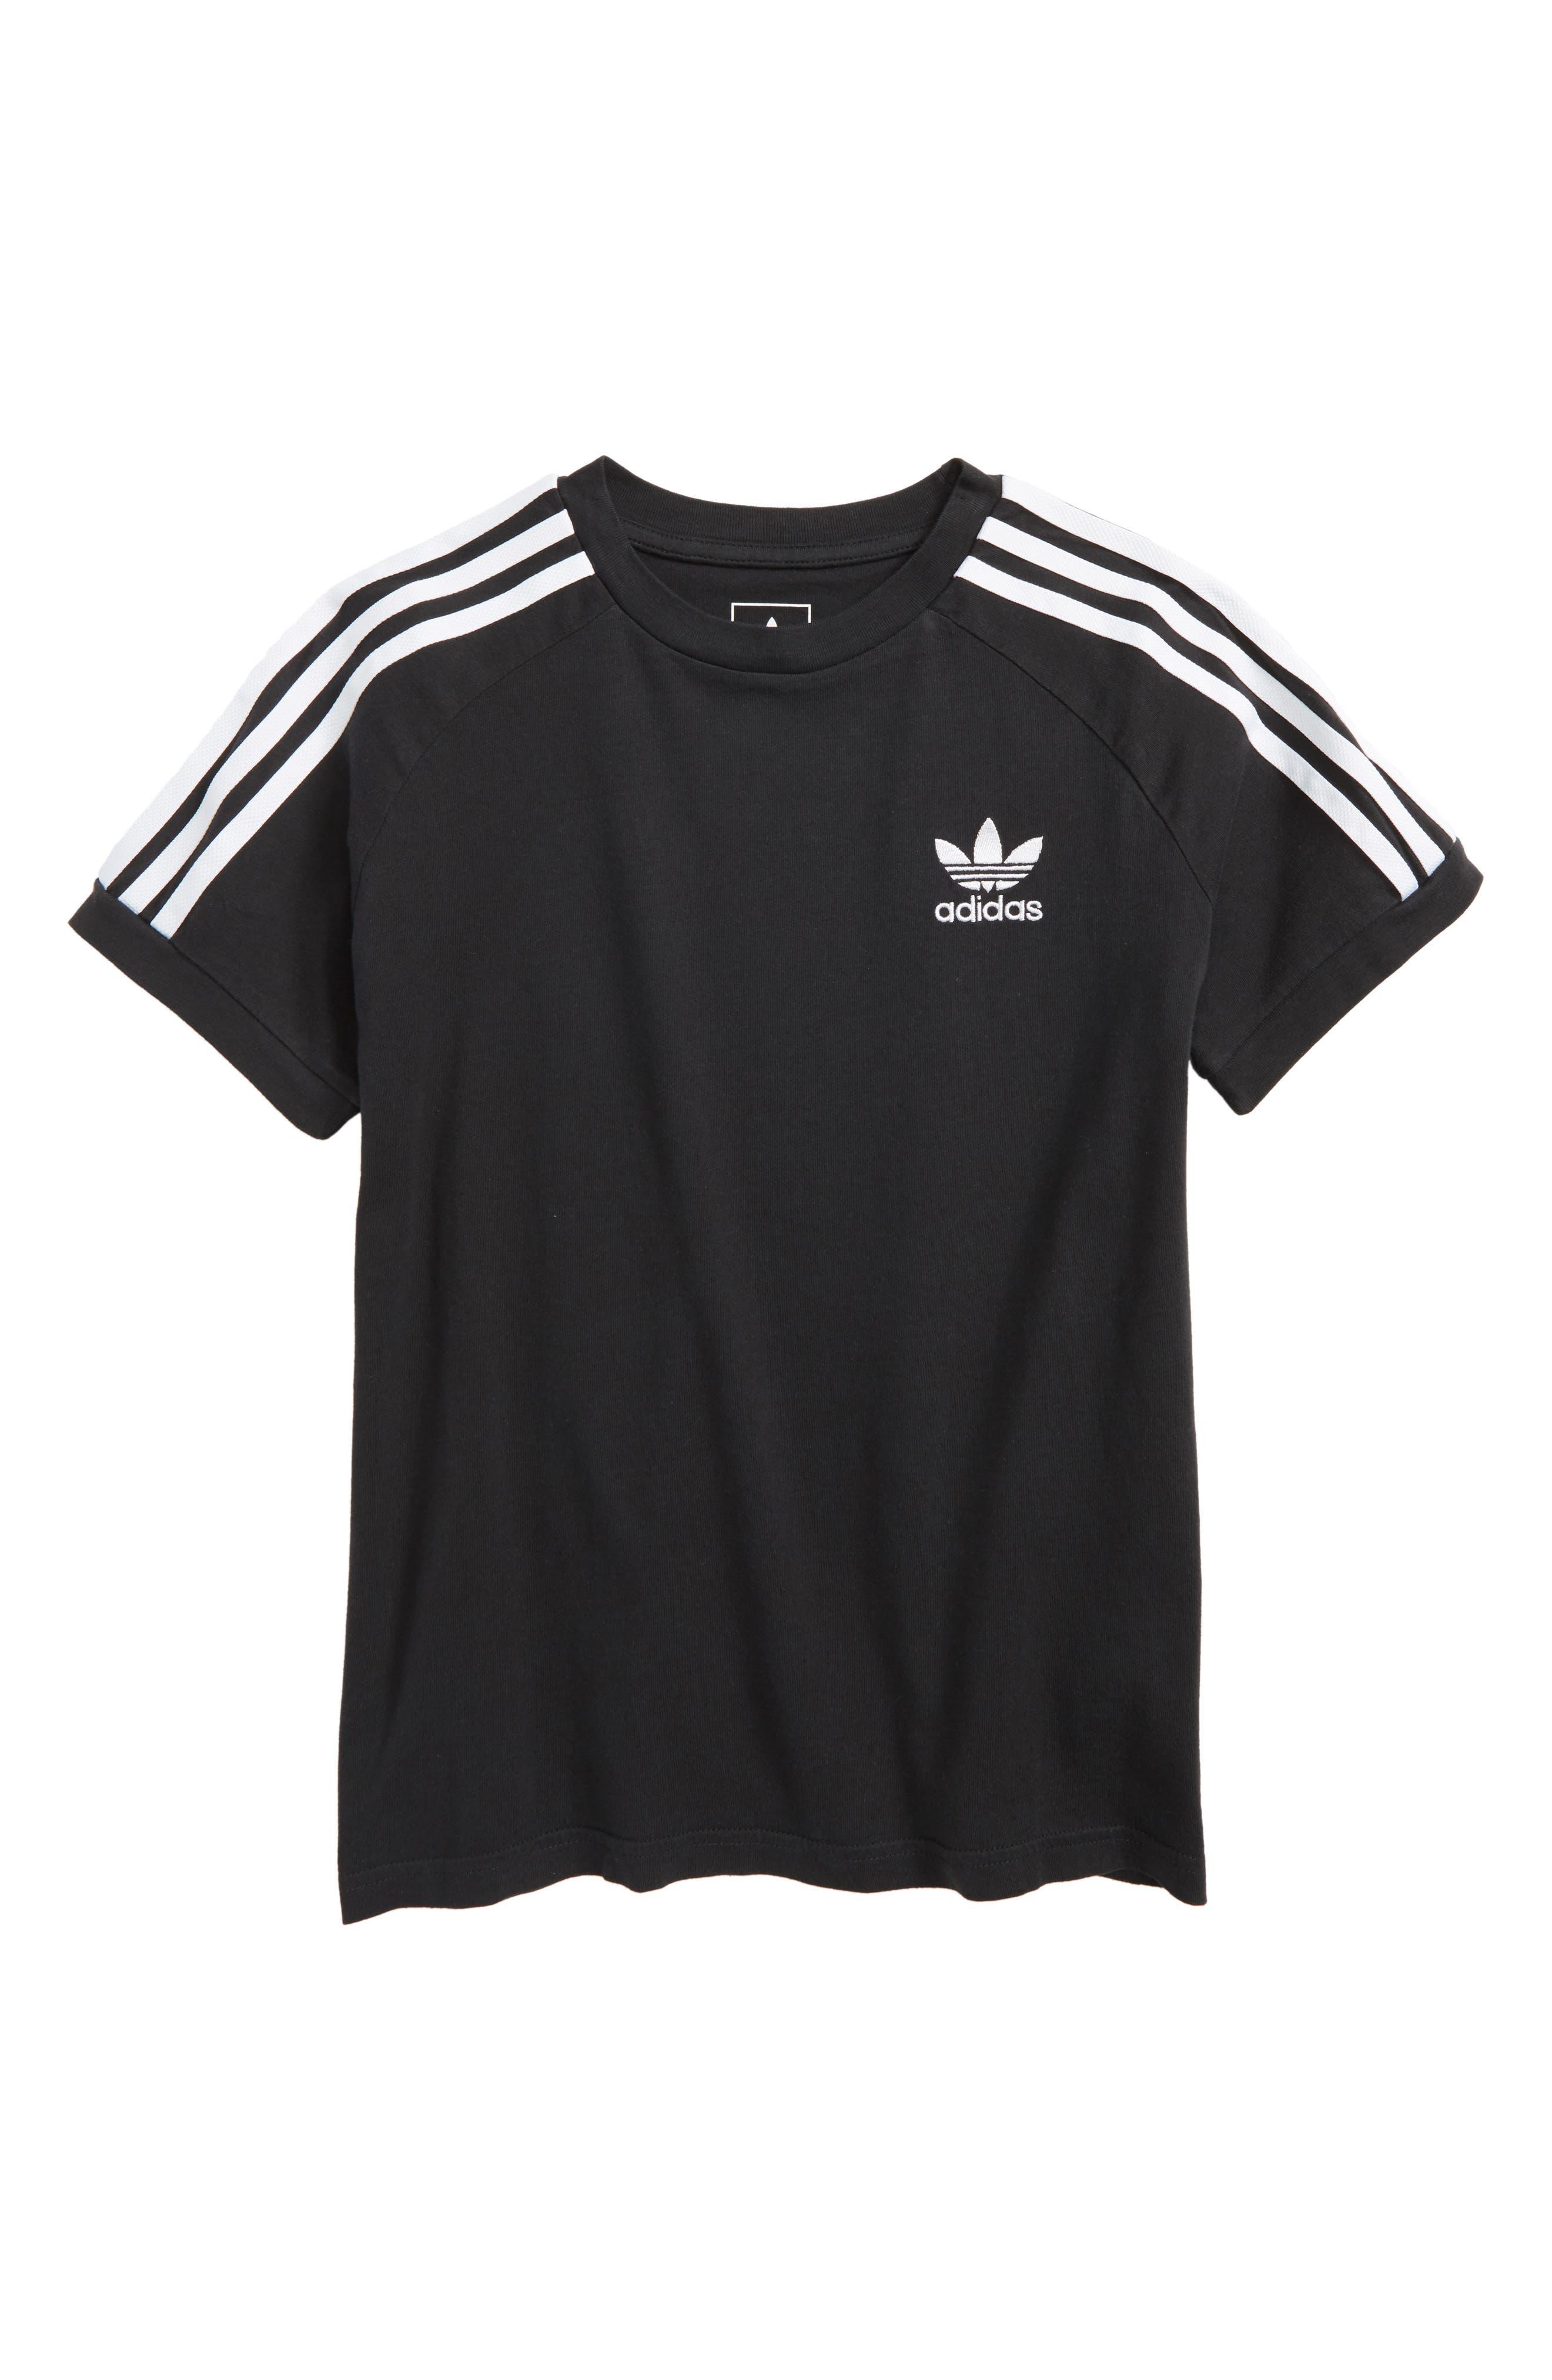 Boys Adidas Originals California TShirt